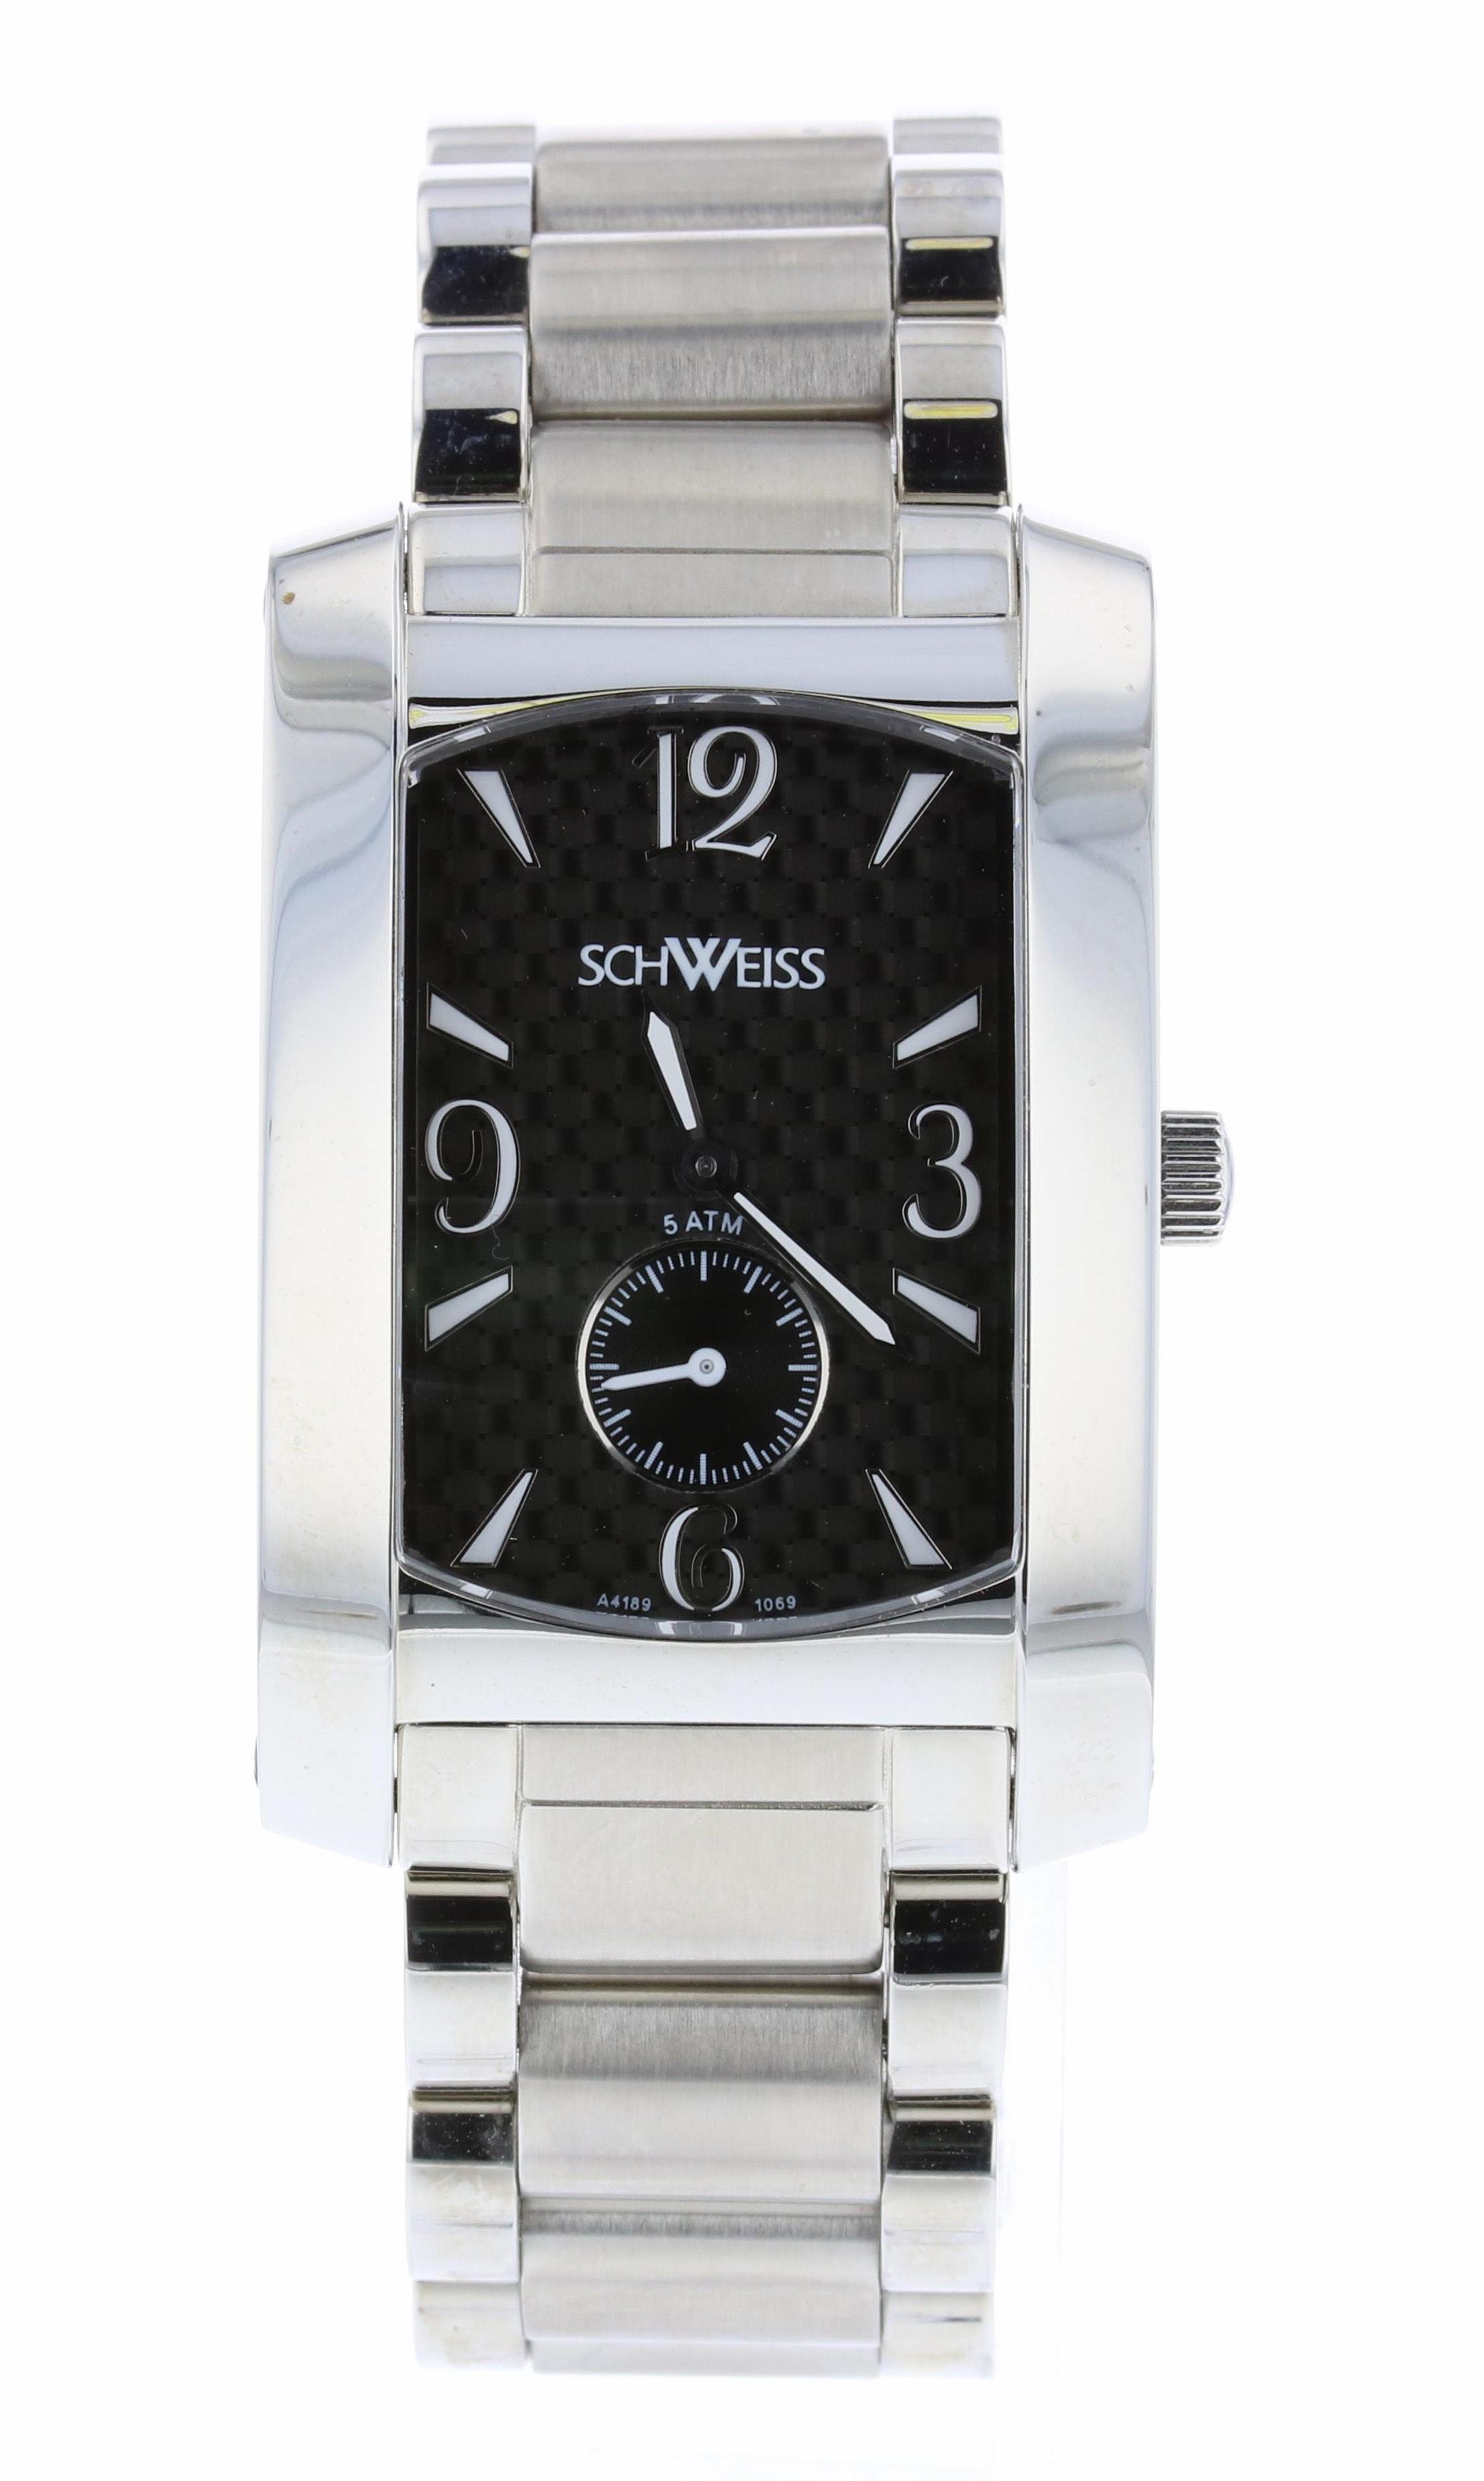 Schweiss Stainless Steel Oyster Wristwatch